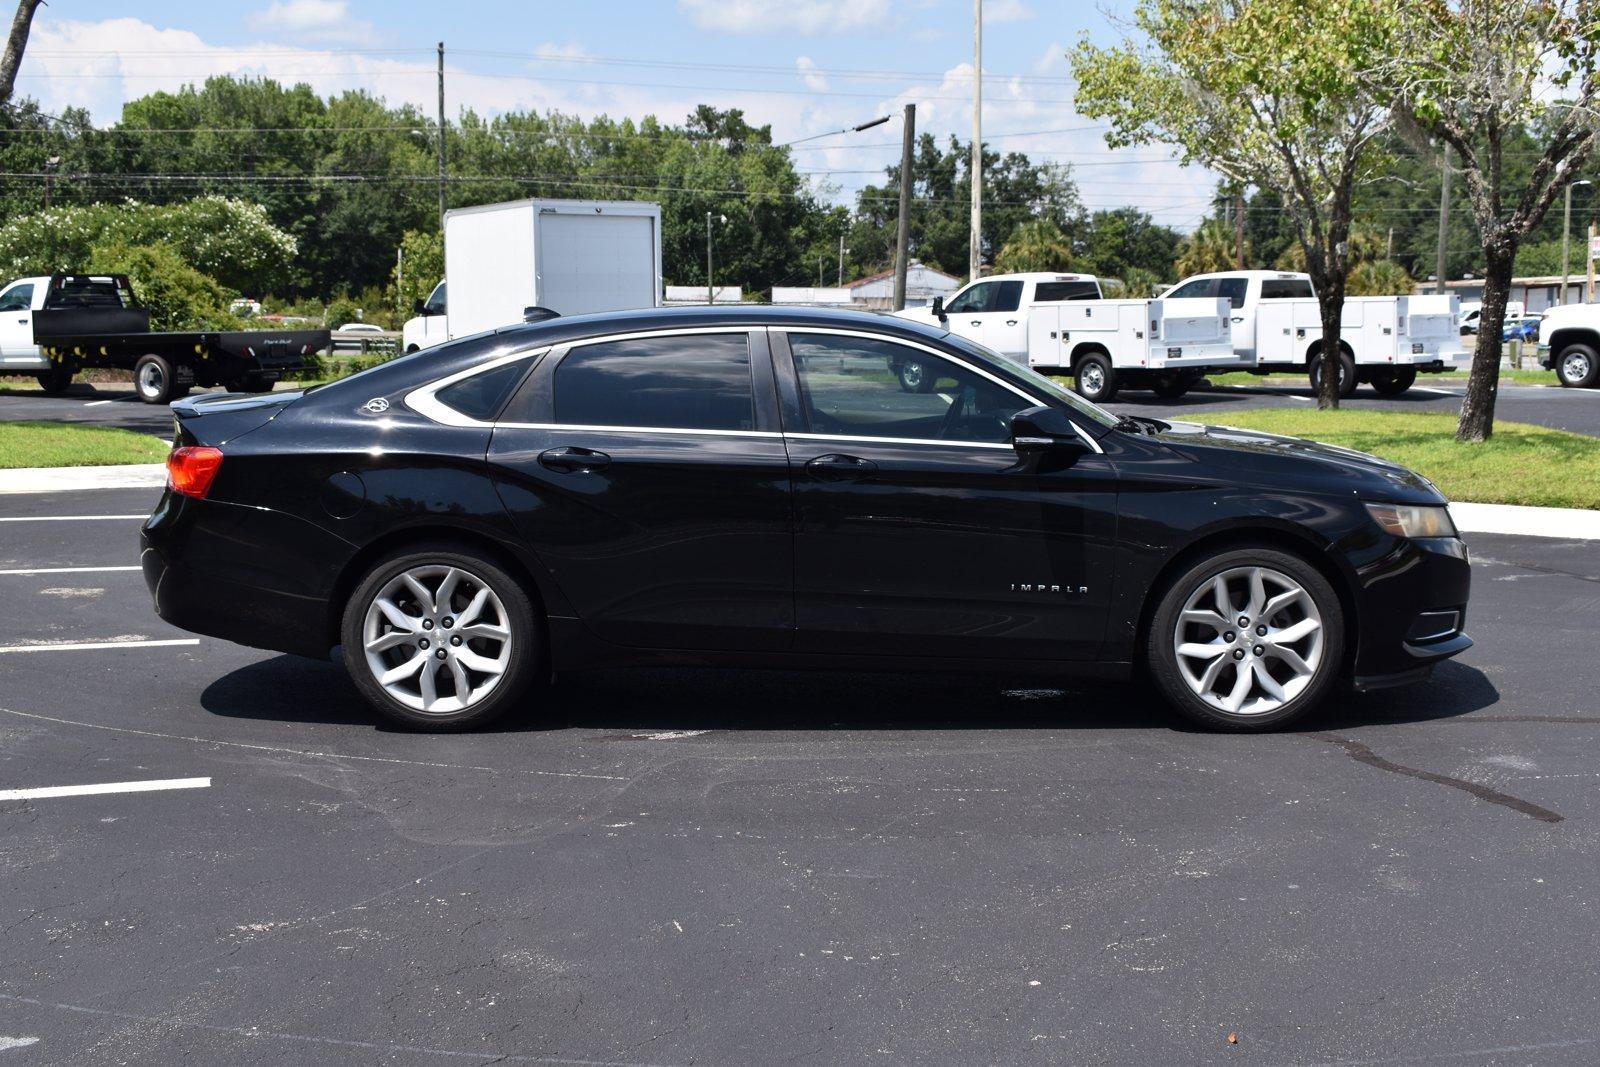 2014 Chevrolet Impala Vehicle Photo in TALLAHASSEE, FL 32304